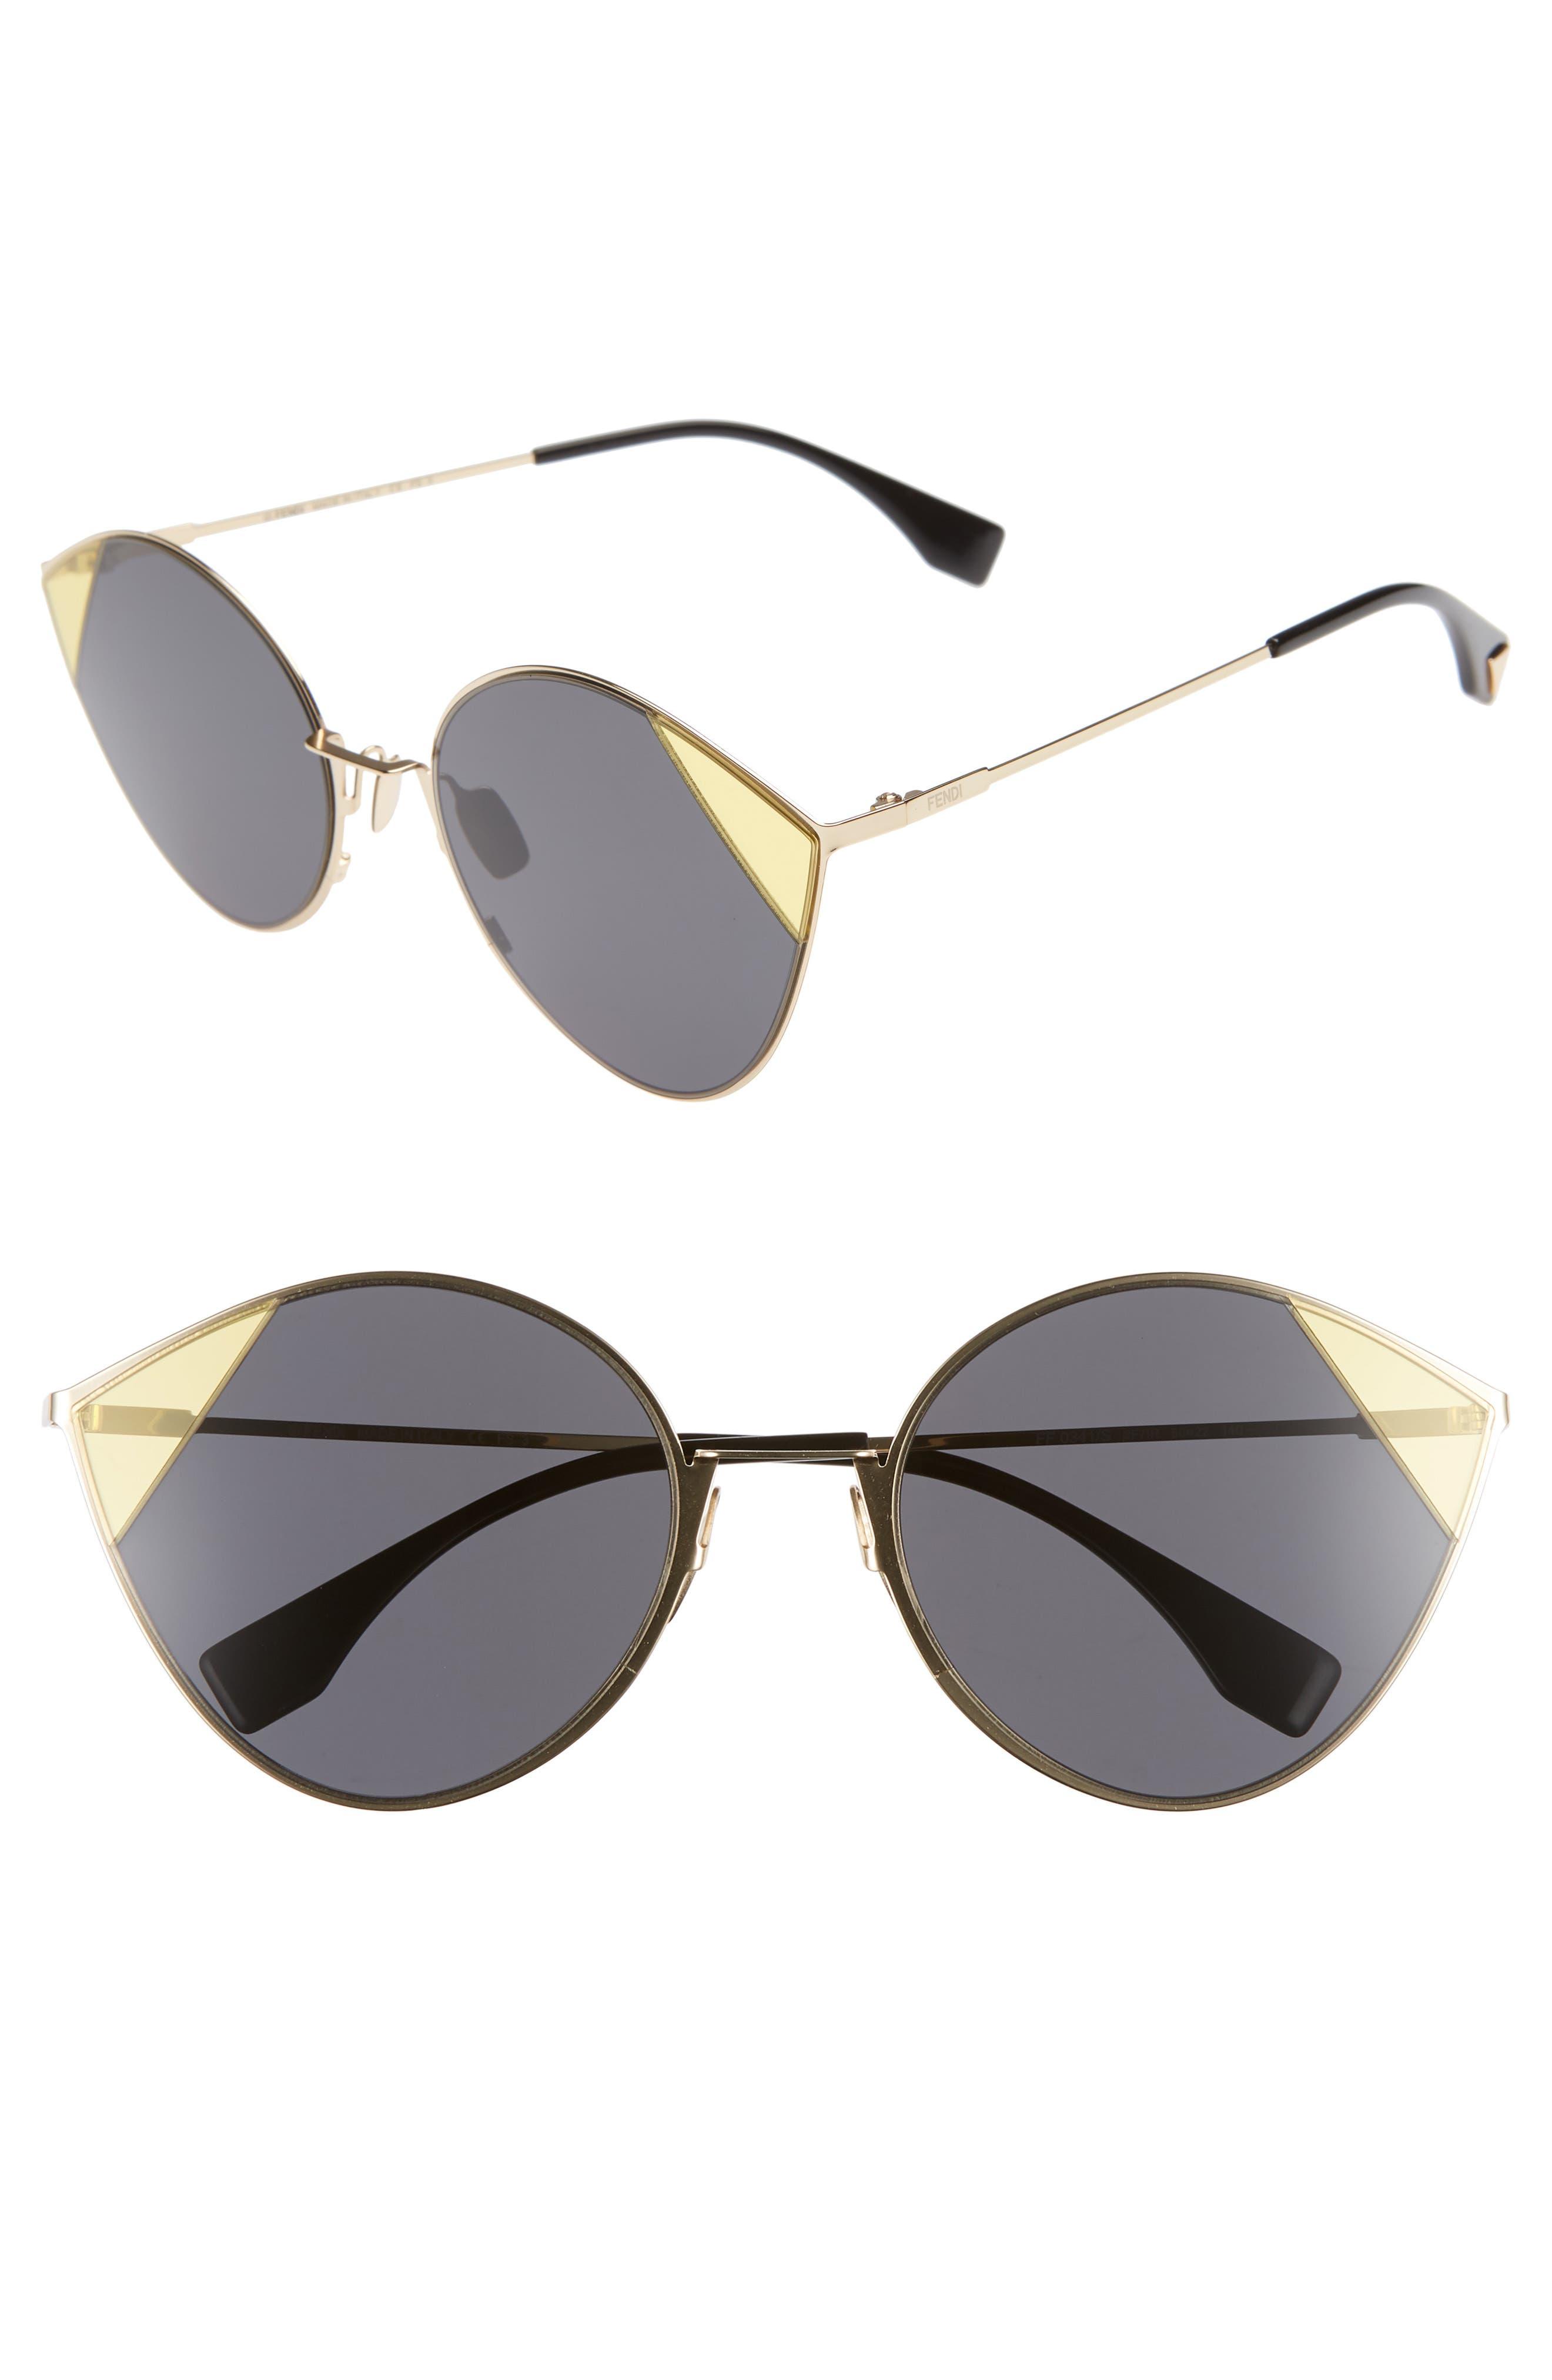 60Mm Cat Eye Sunglasses - Antique Gold/ Grey